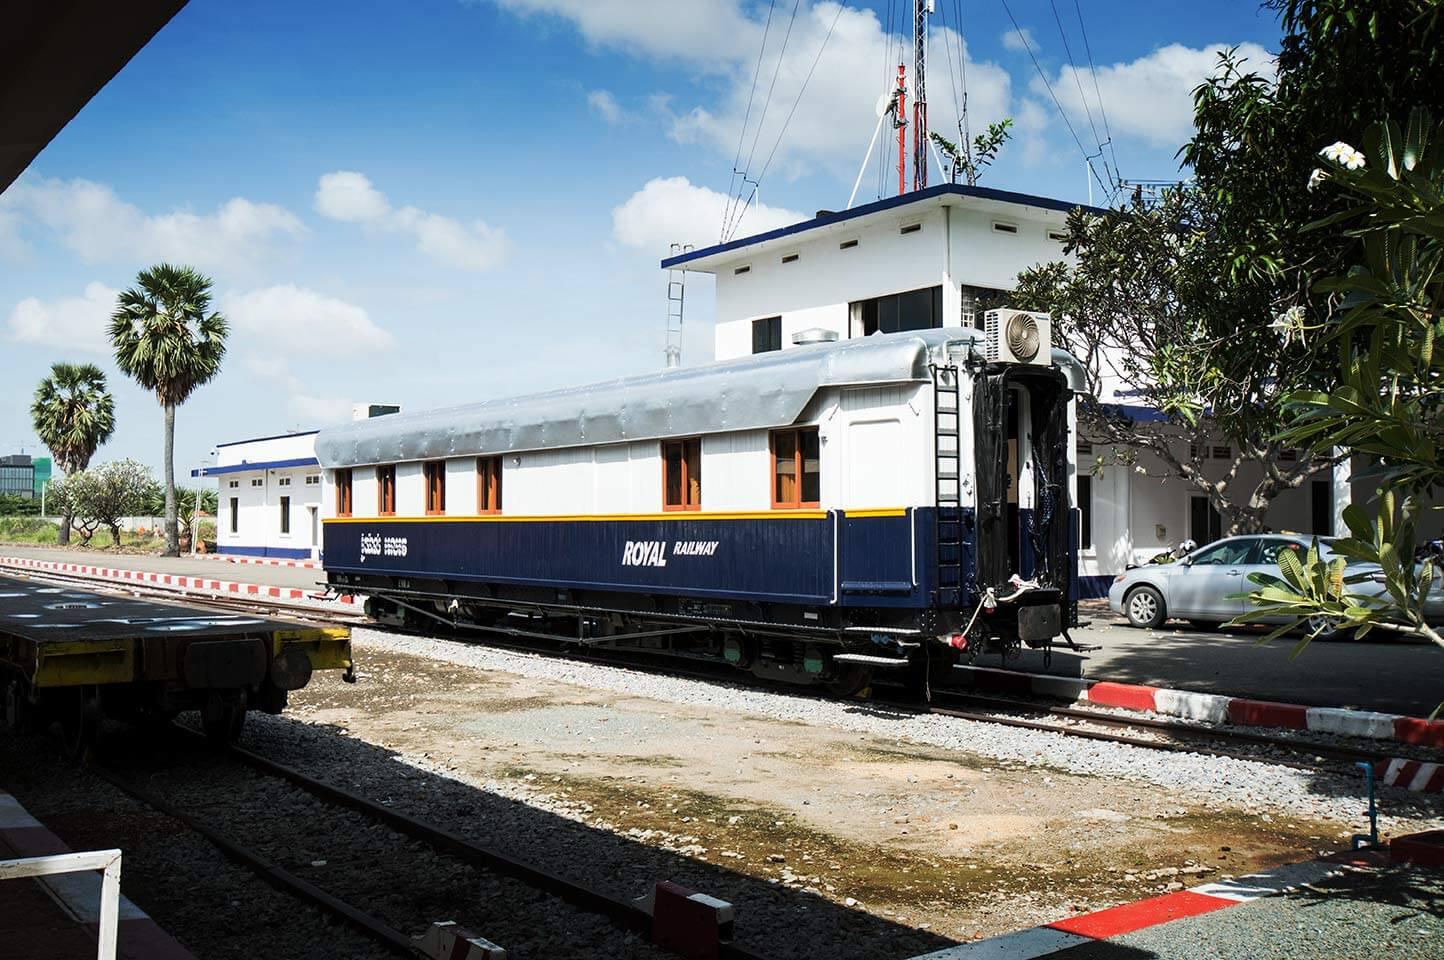 Eisenbahnwaggon am Bahnhof in Phnom Penh